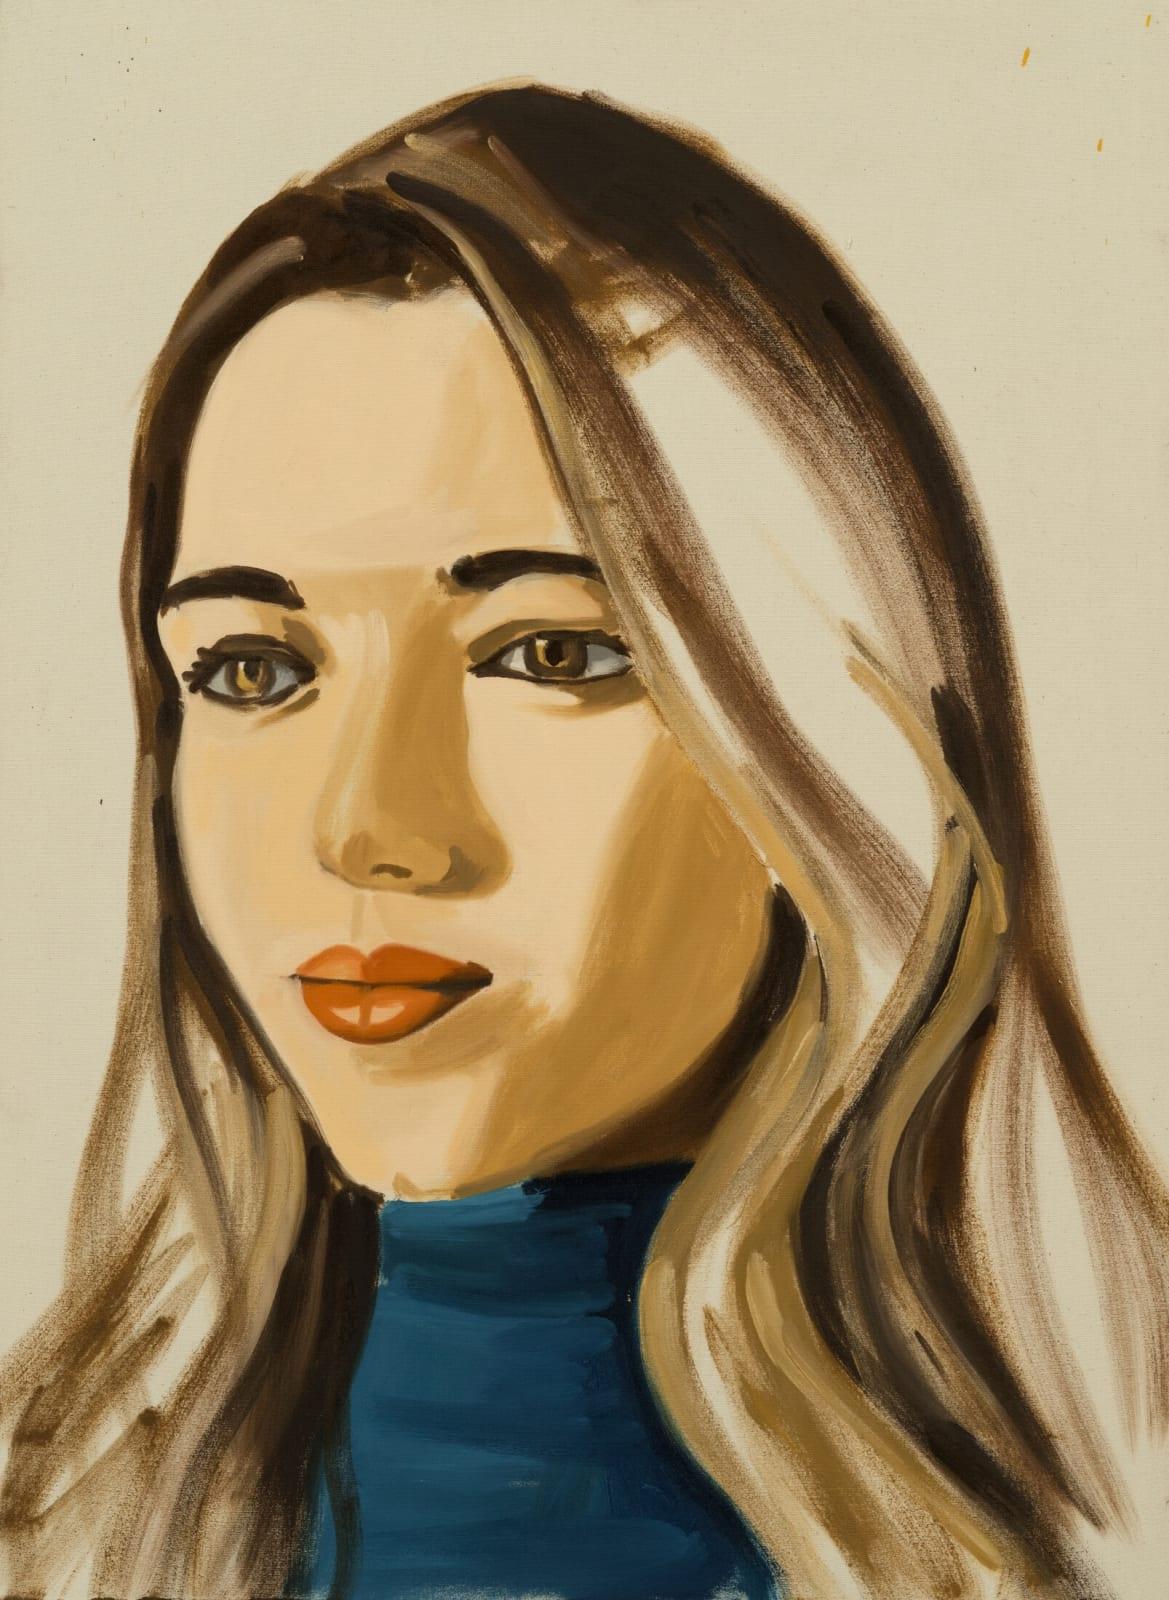 David Salle Untitled (portrait 05) 2019 oil on linen 30 x 22 inches 76.2 x 55.9 cm